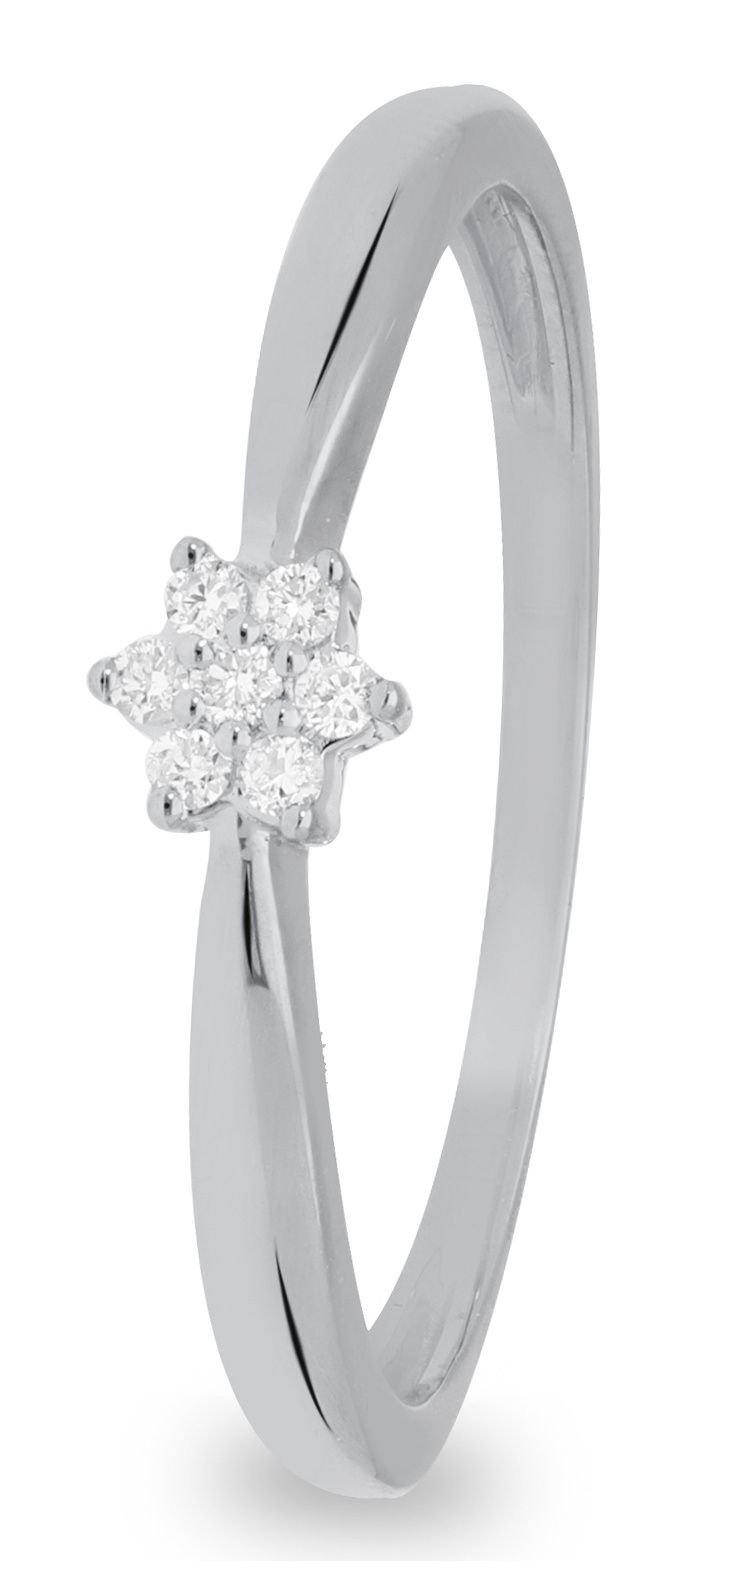 14 karaat witgouden ring dames met 7 diamanten 00.5 crt. - Solitair - Witgoud-1